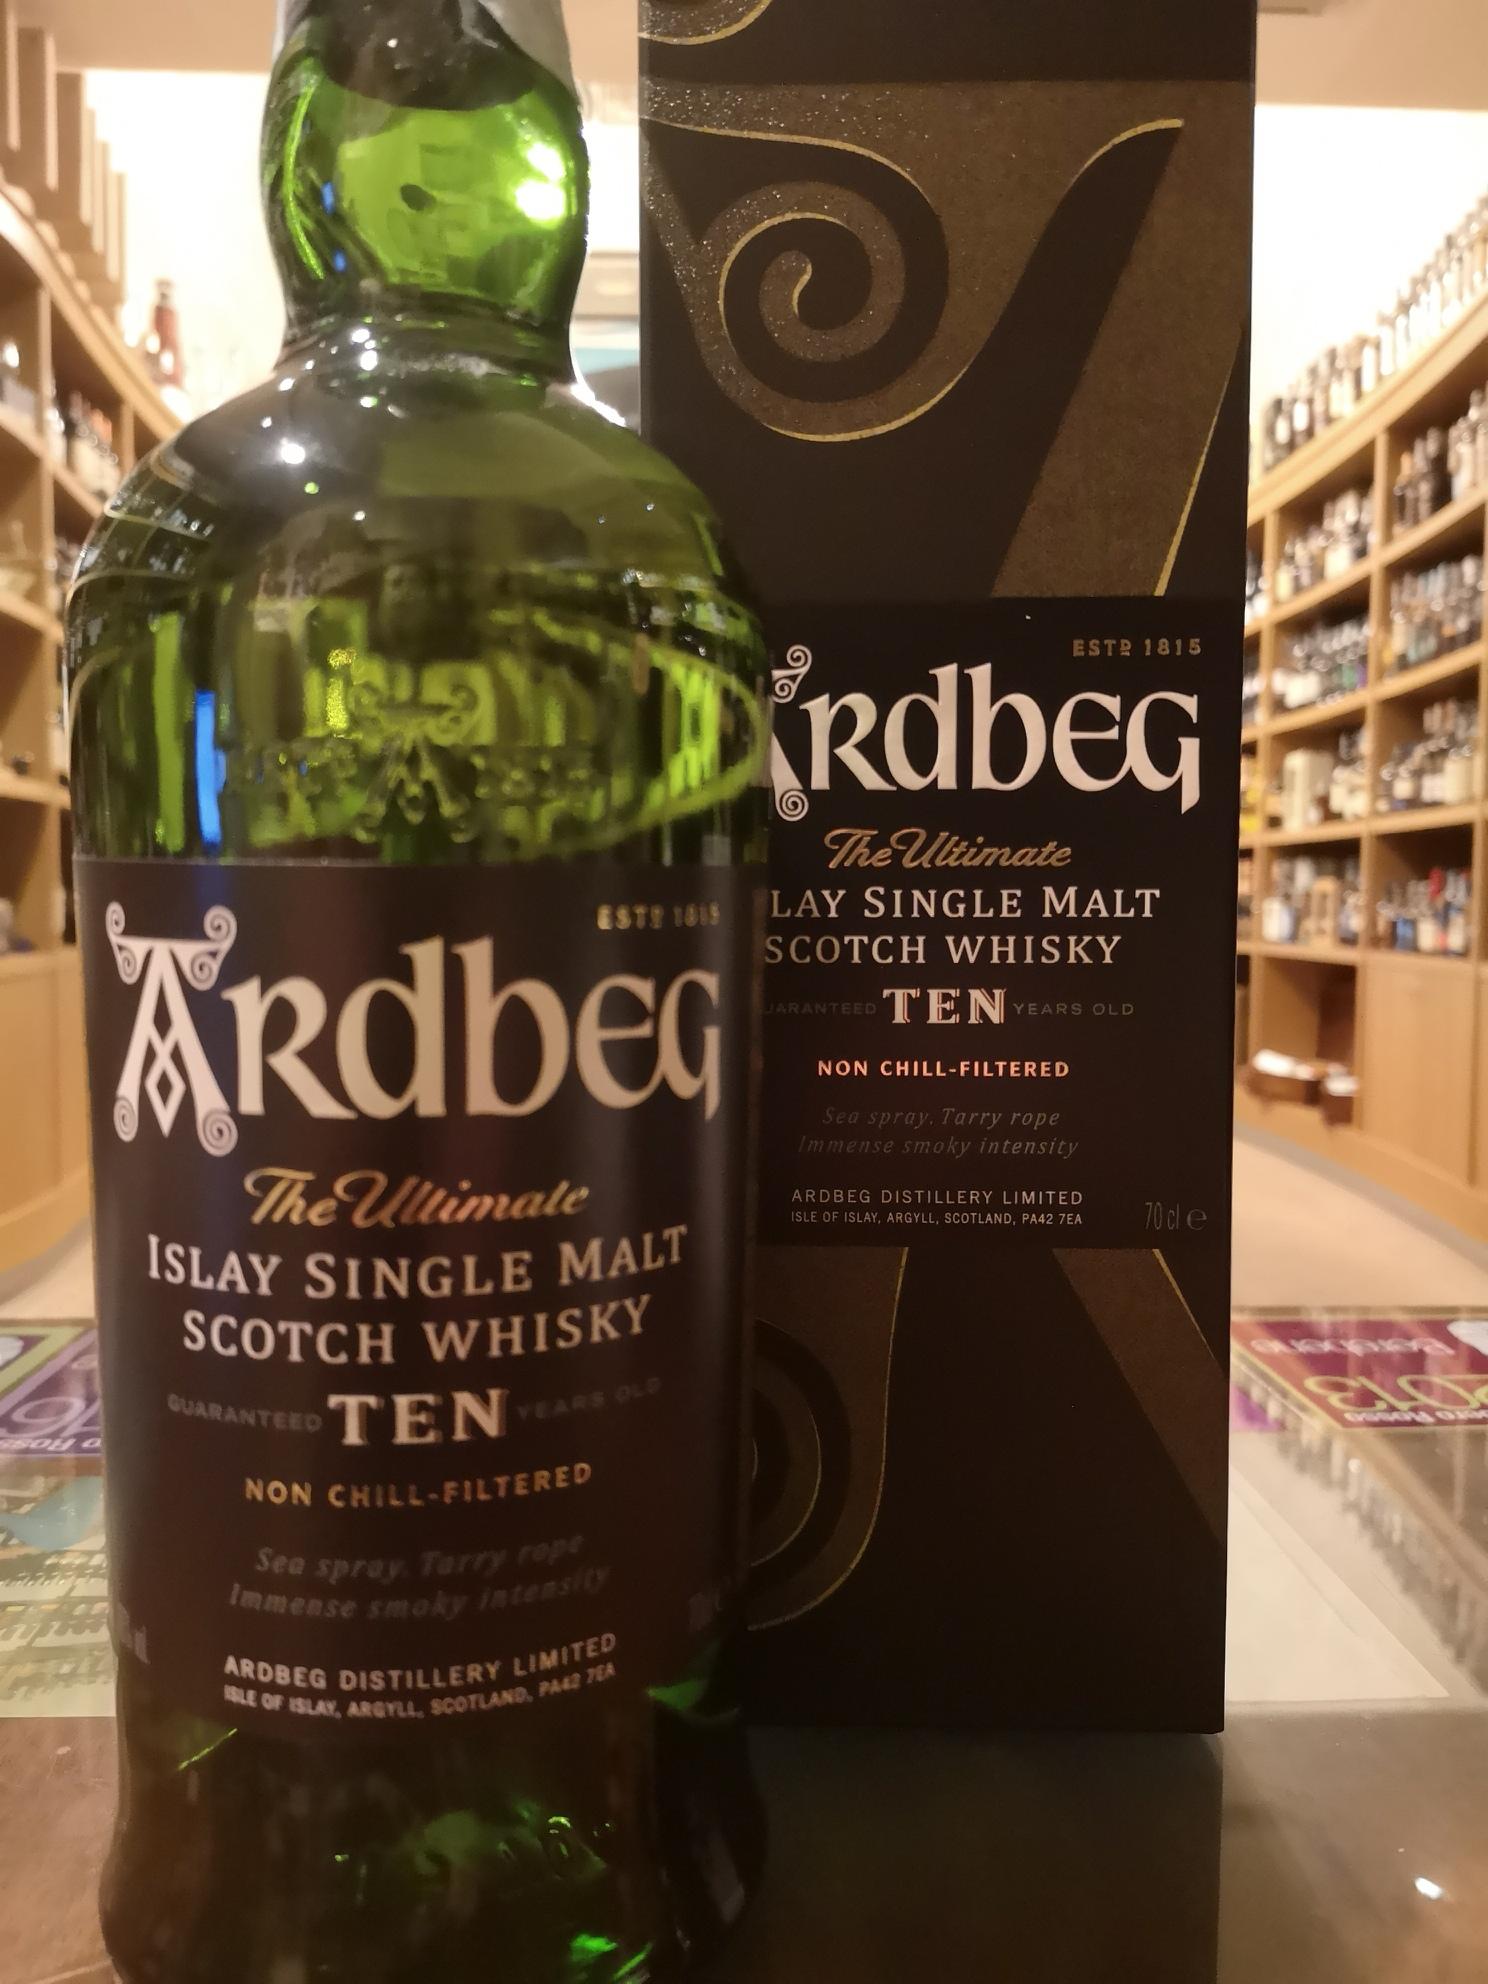 Ardbeg Islay Single Malt Scotch Whisky 10 YO